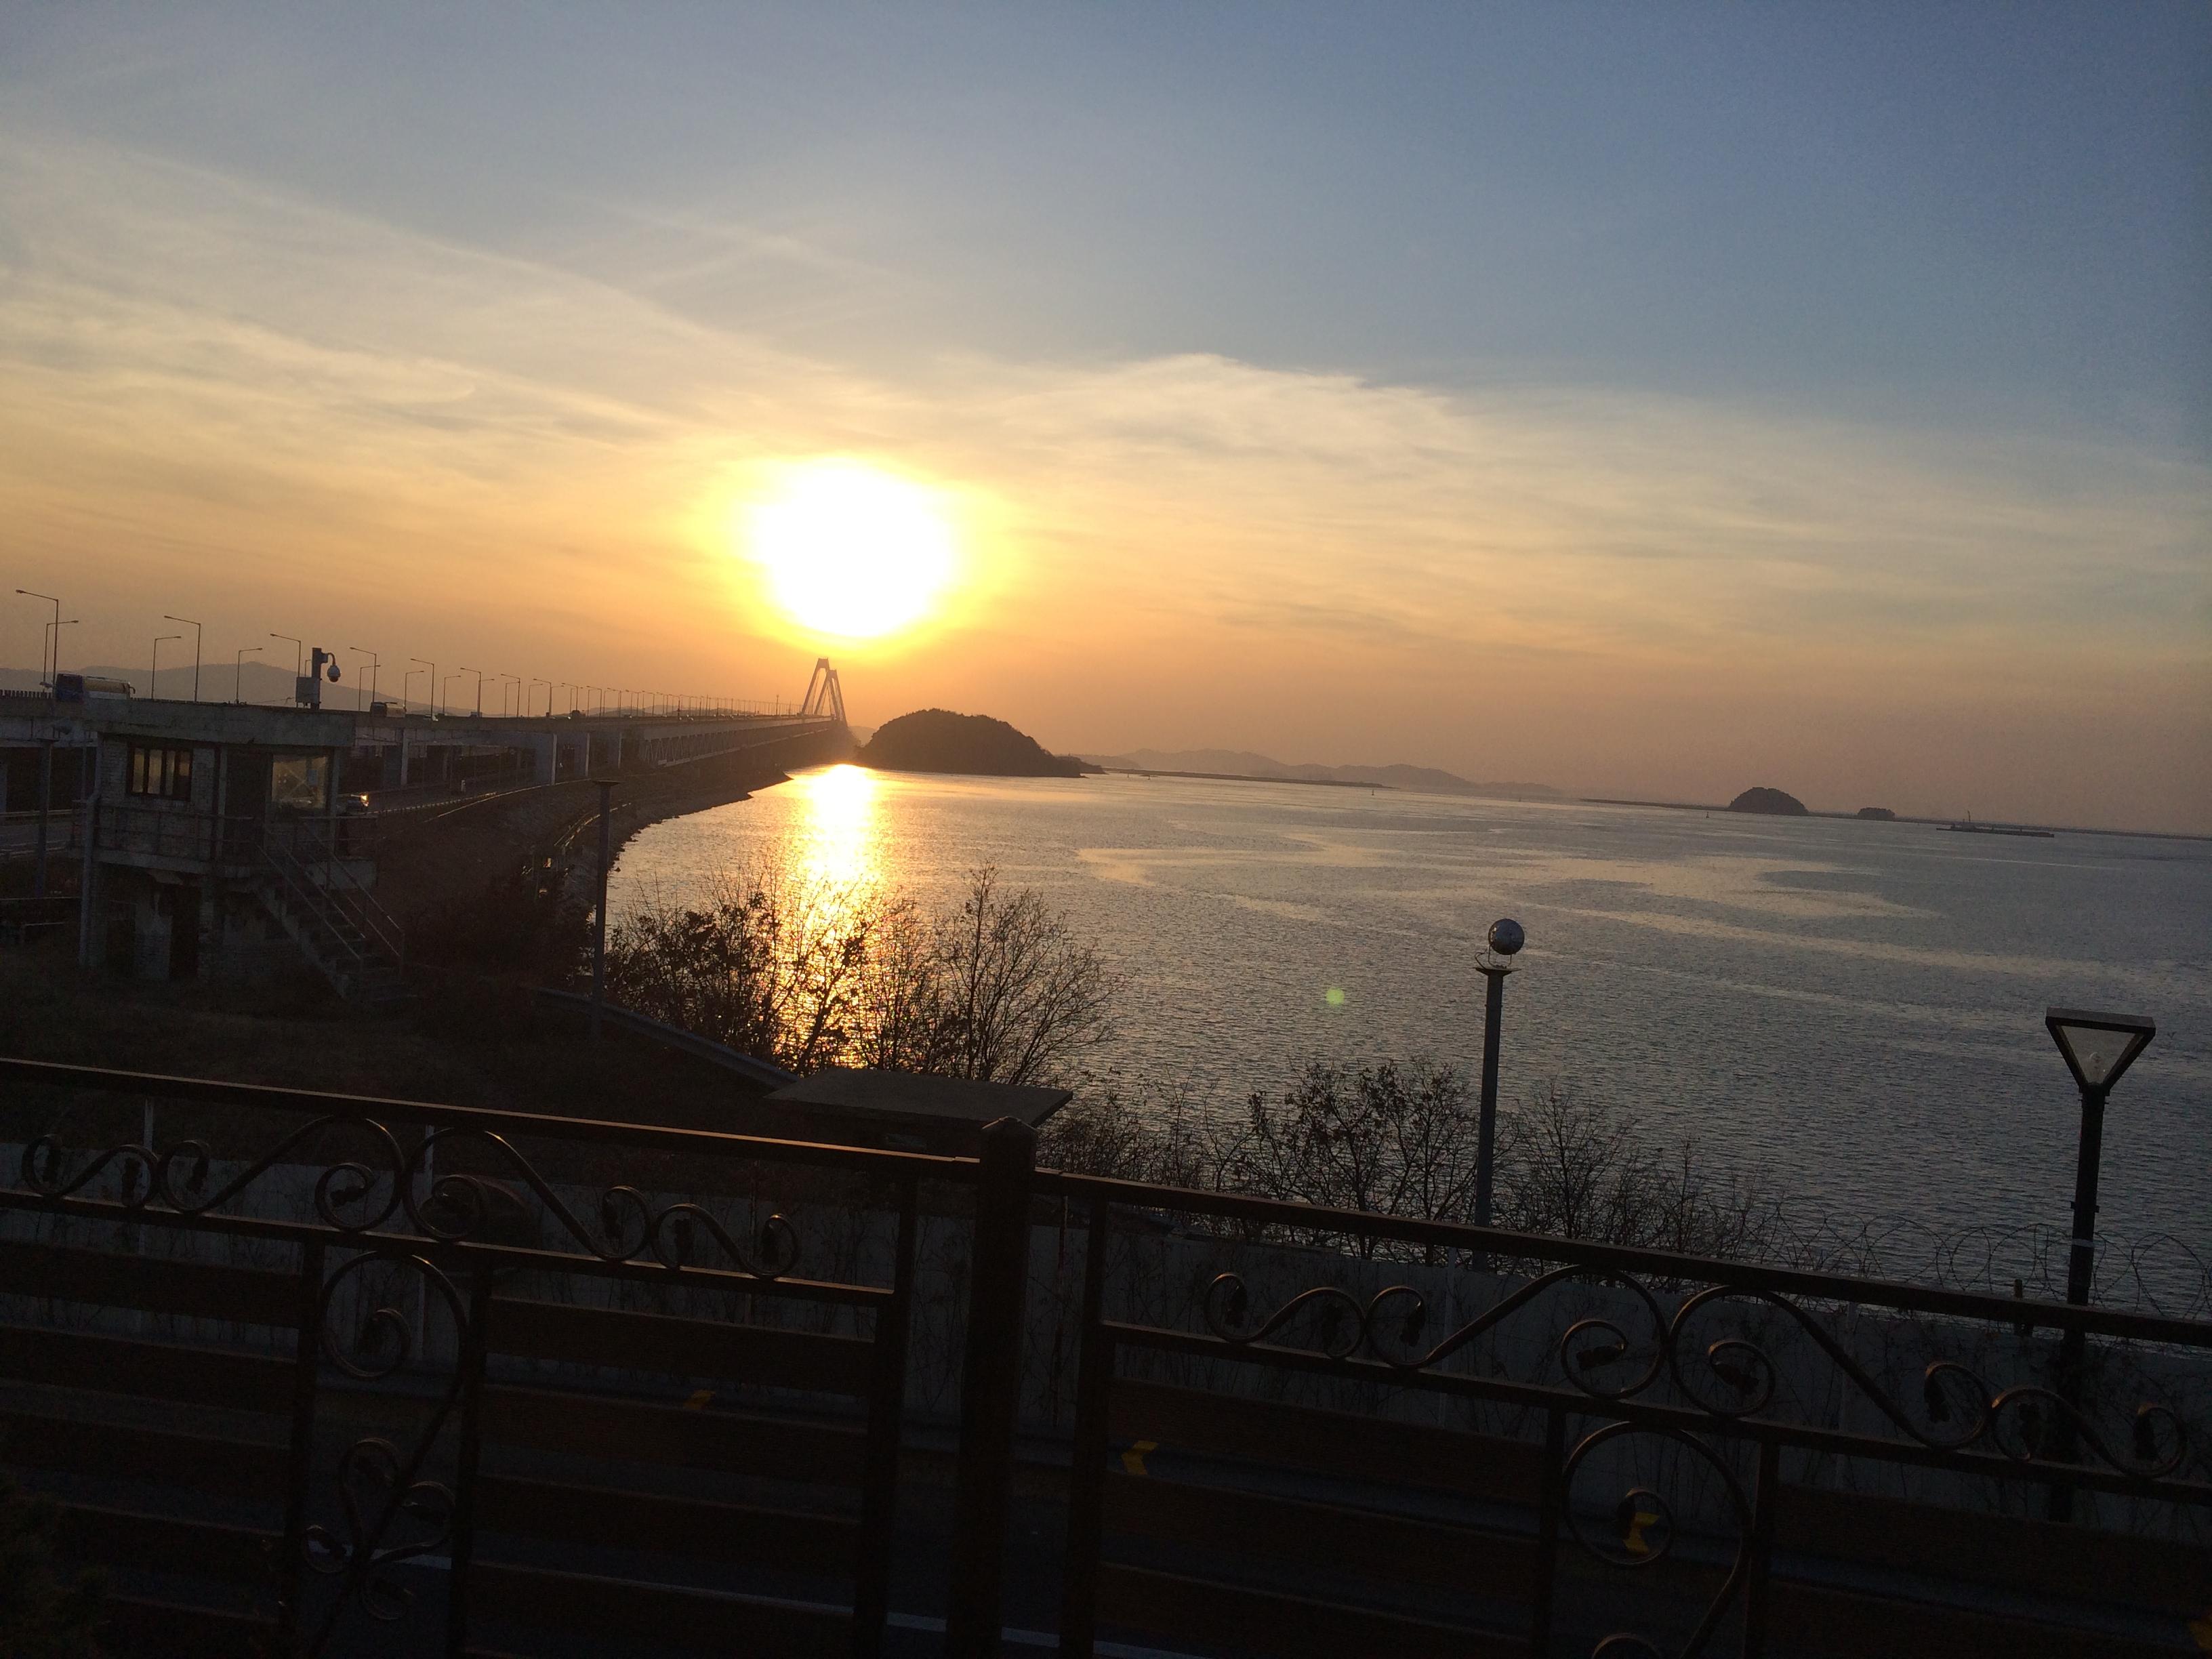 Shabby sunset